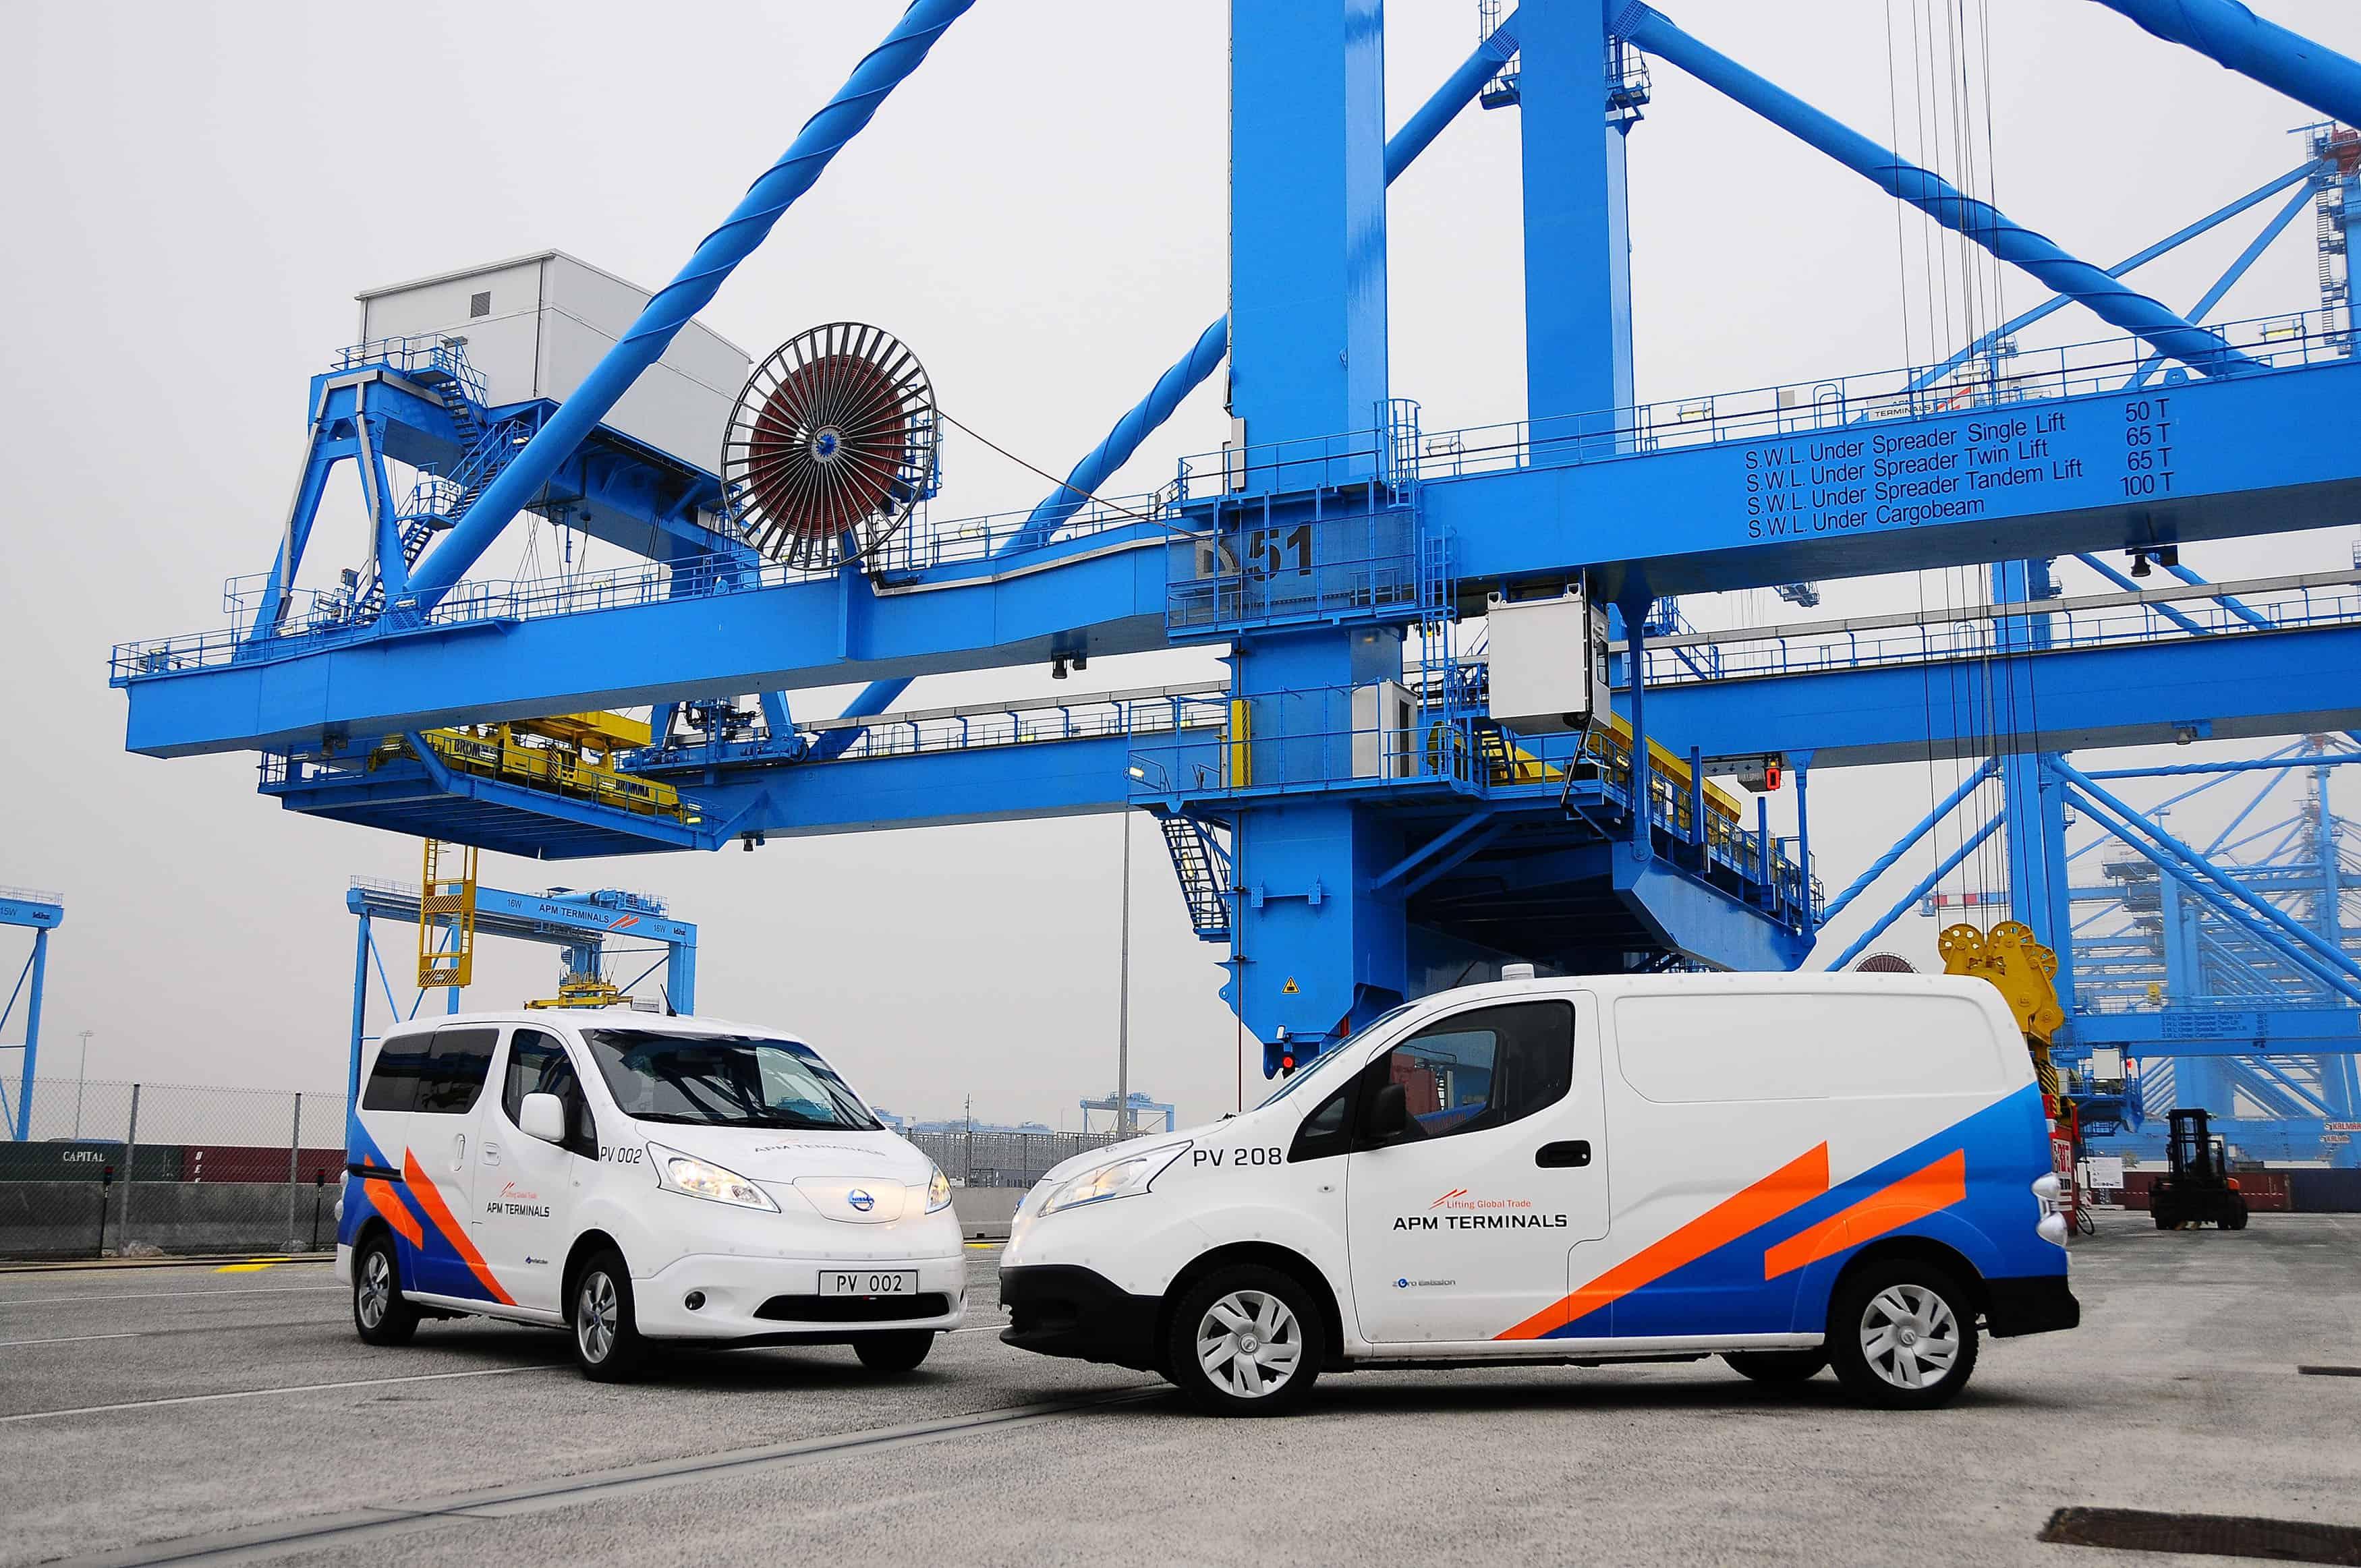 APMT's zero-emission Nissan Evalia (left) and Nissan van (right)